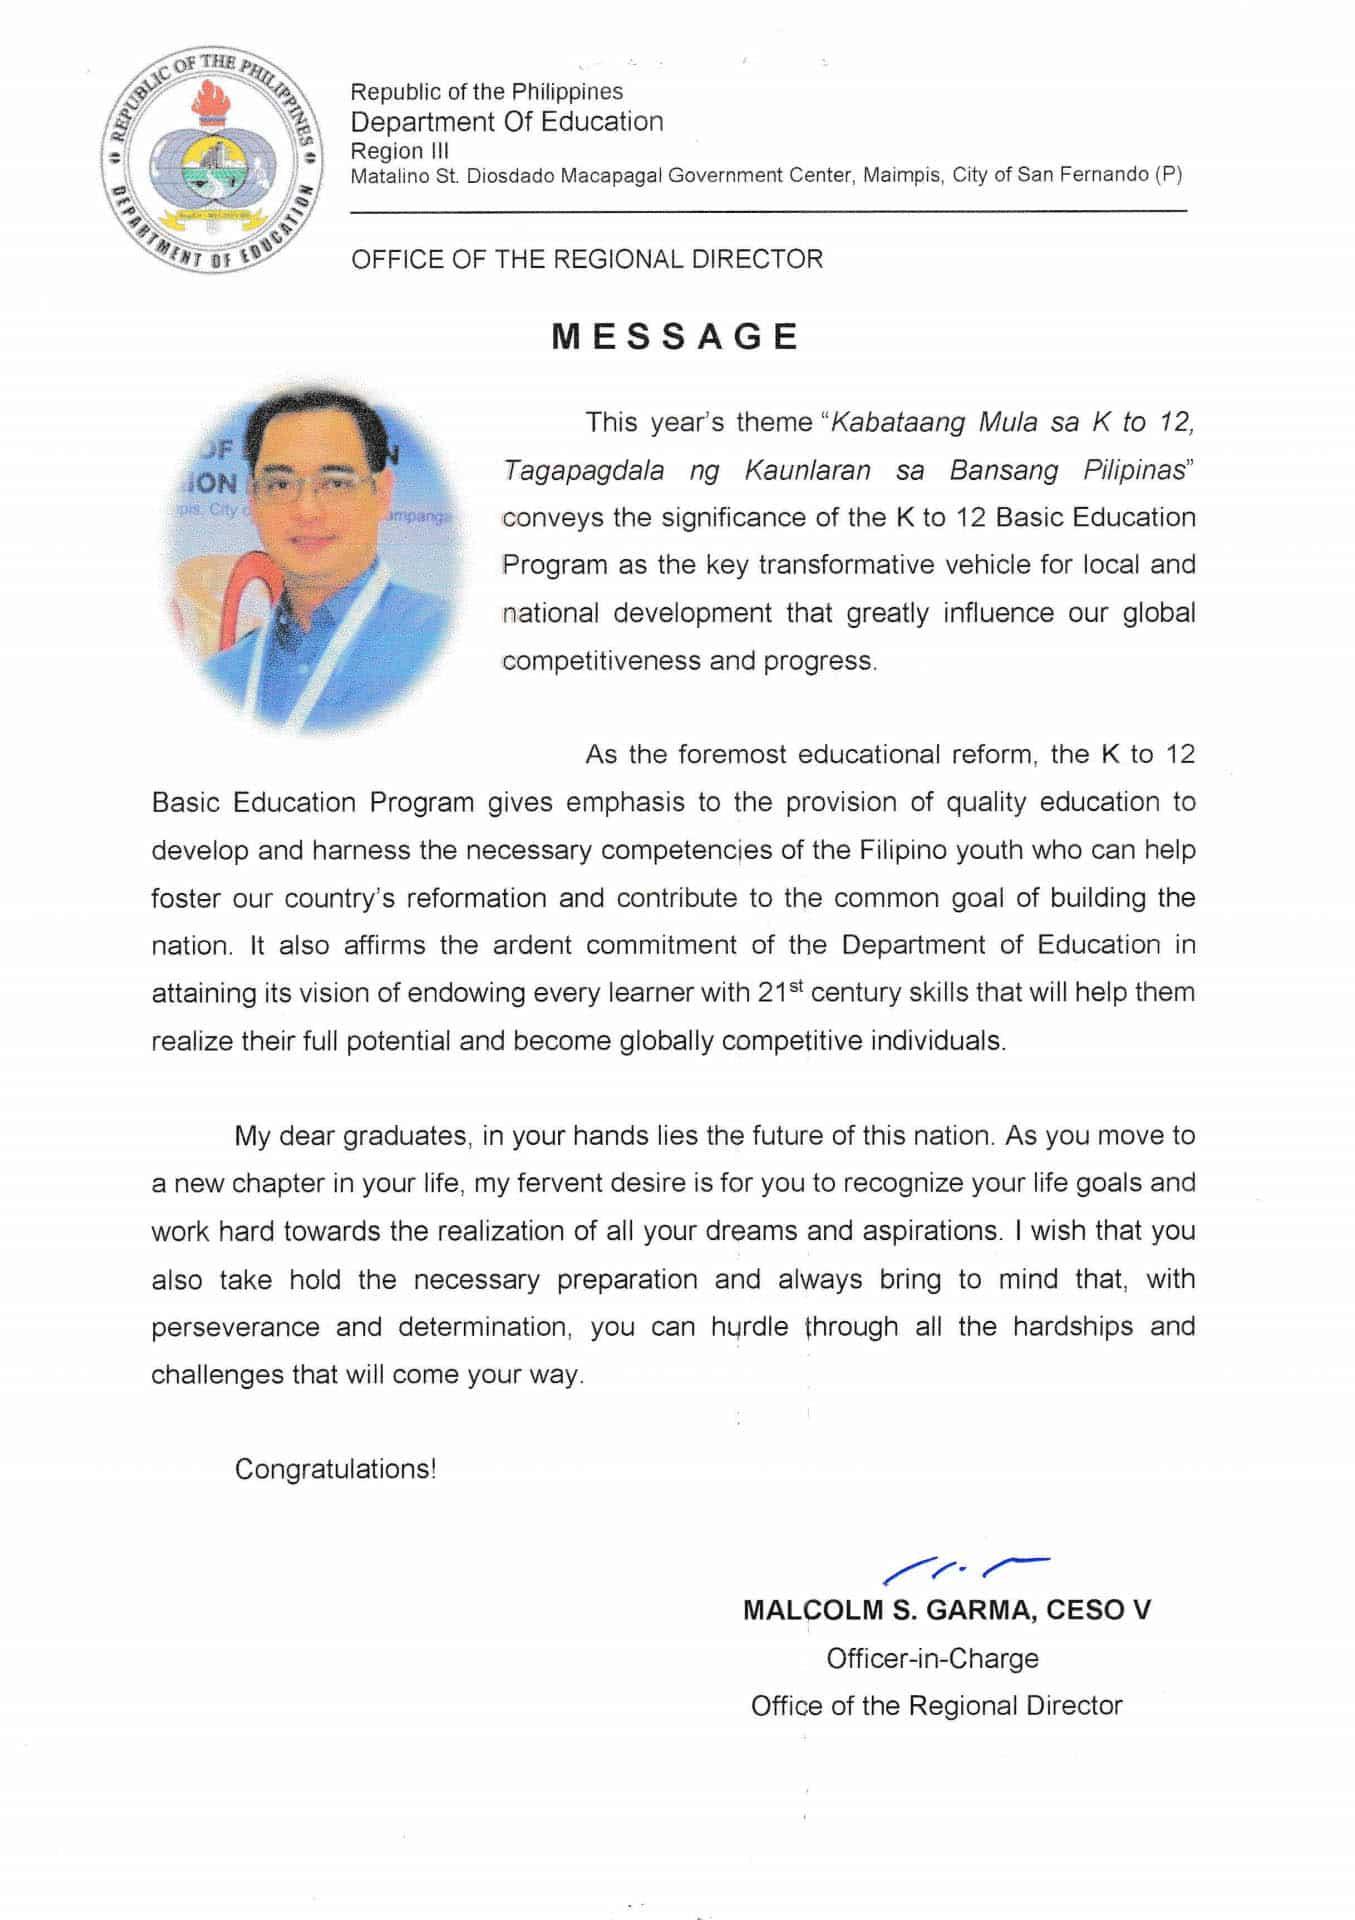 Graduation Message Of Regional Director Malcolm Garma Teacherph